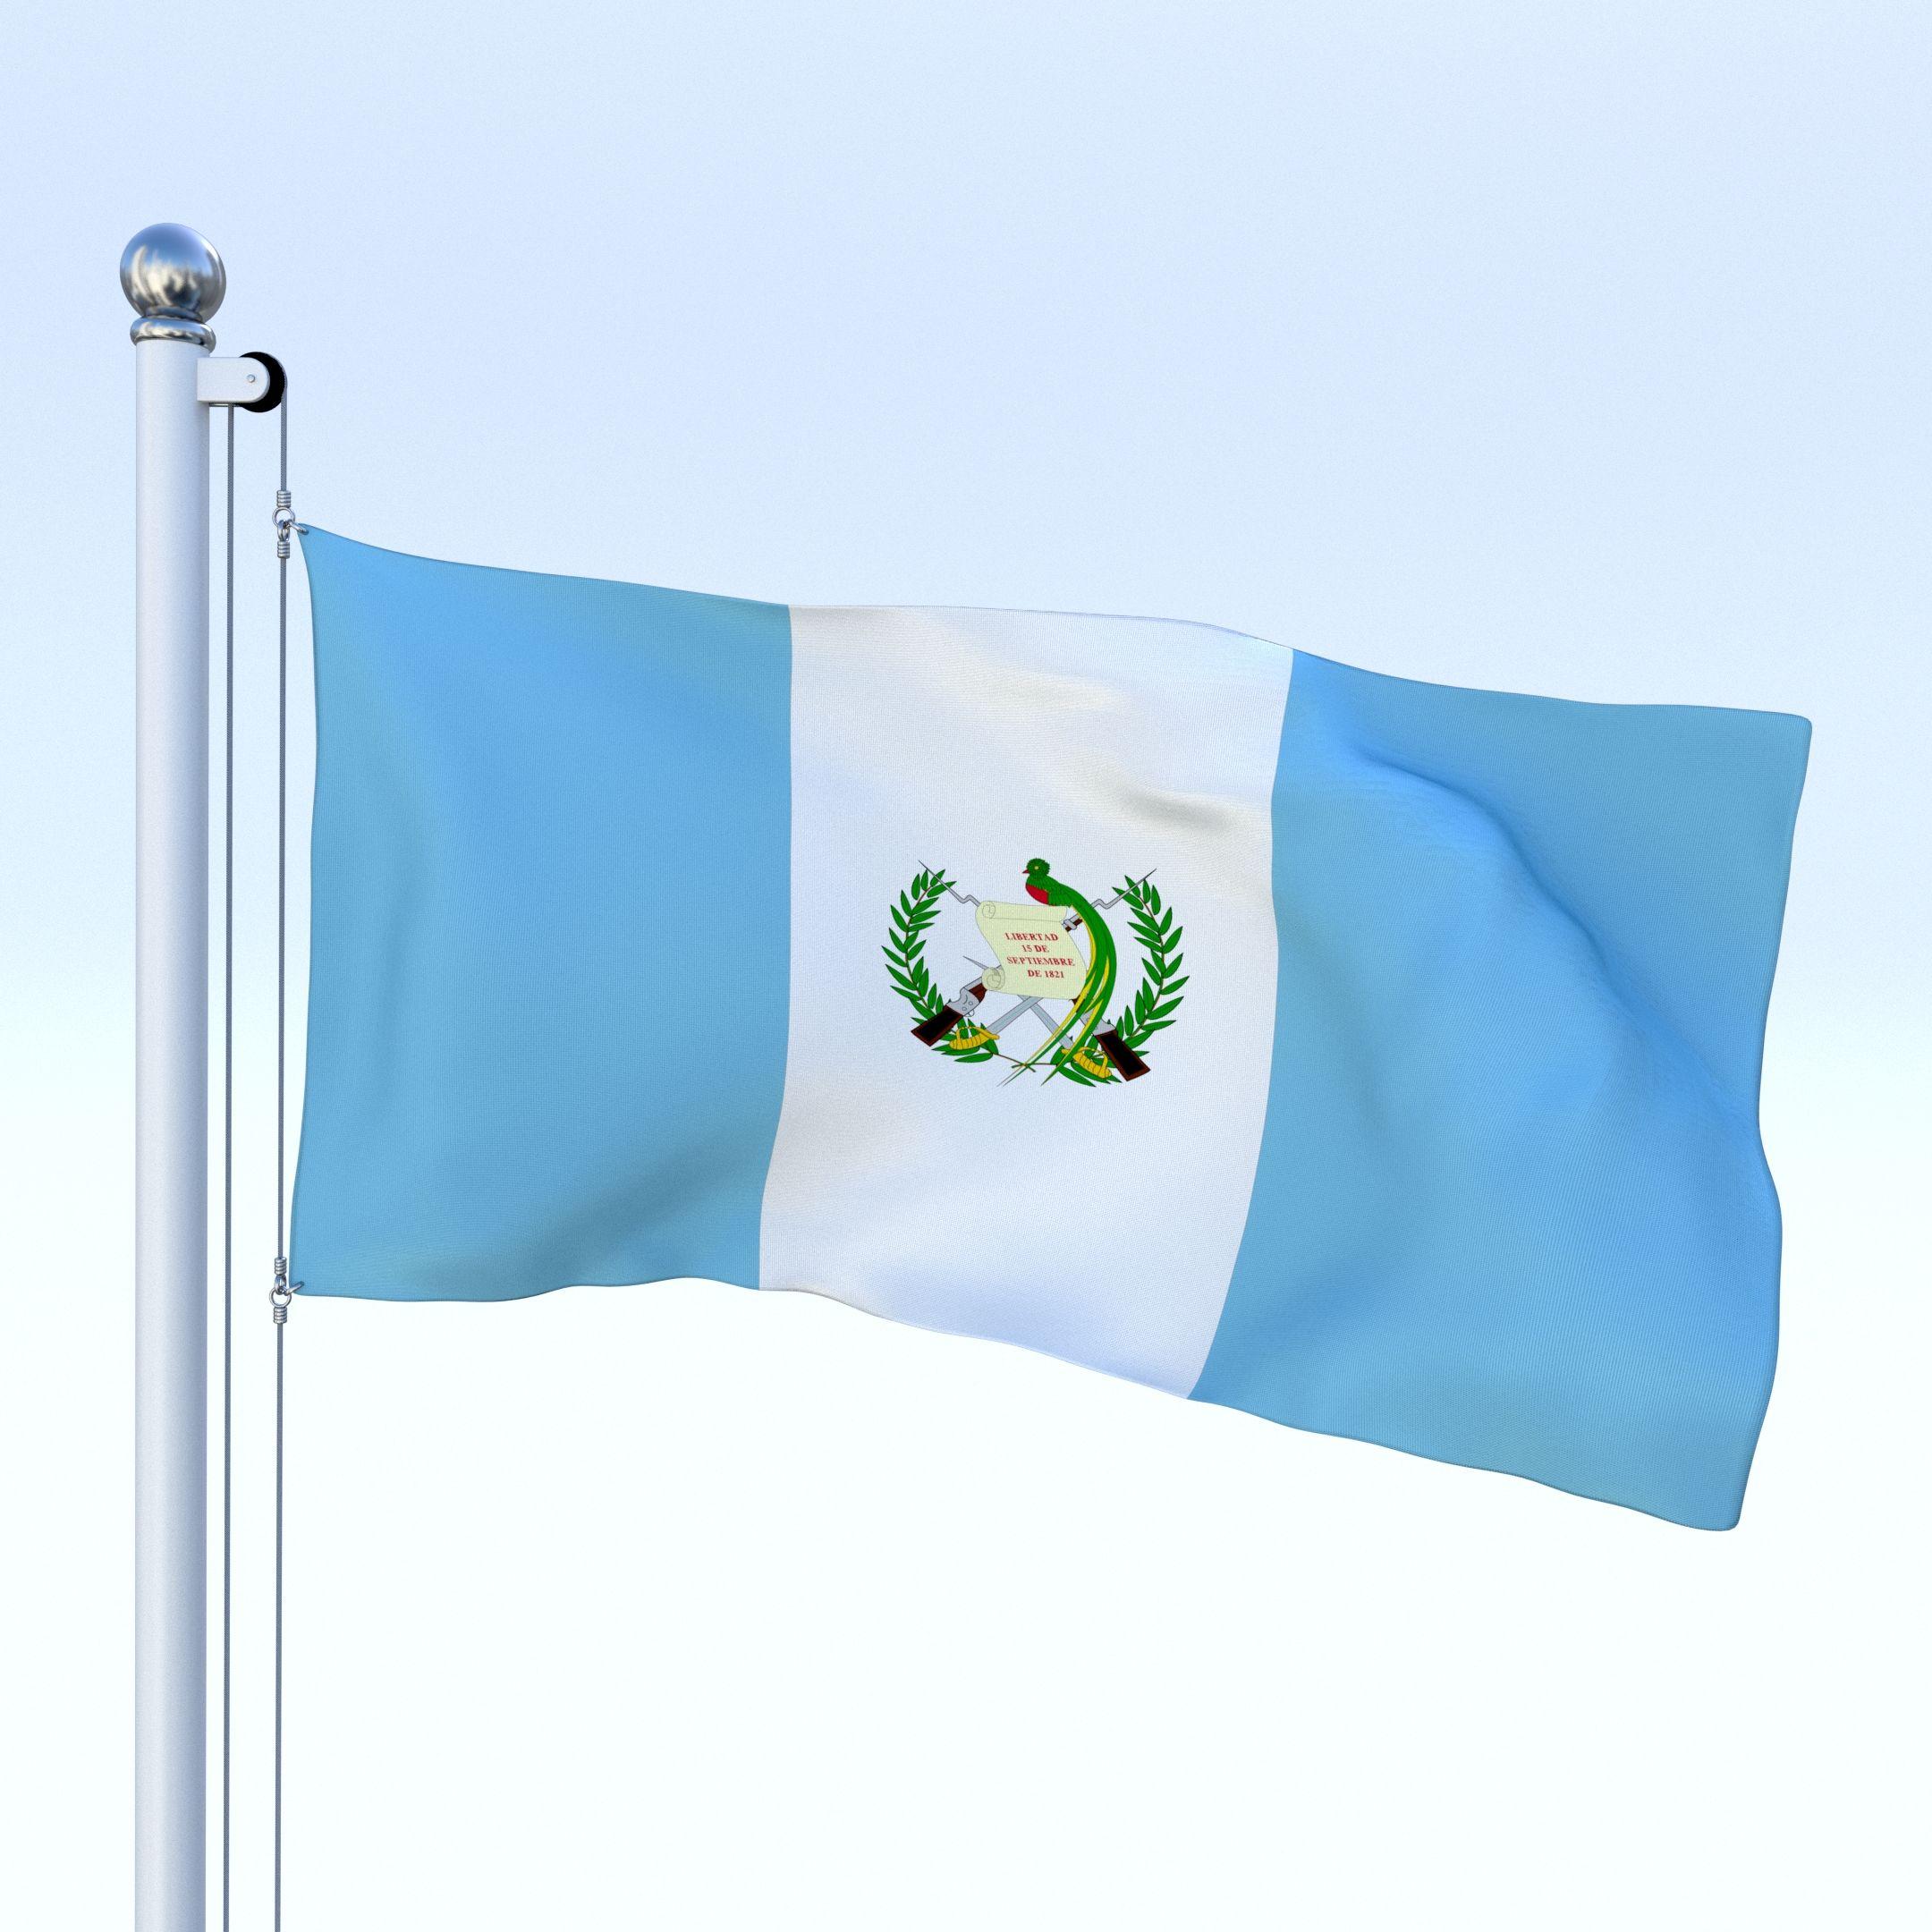 Download Wallpapers Guatemalan Flag 4k Grunge North America Flag Of Guatemala National Symbols Guatemala Coat Of Arms Of Guatemala Guatemalan National E Bandera De Guatemala Imagenes De Banderas Escudo De Armas